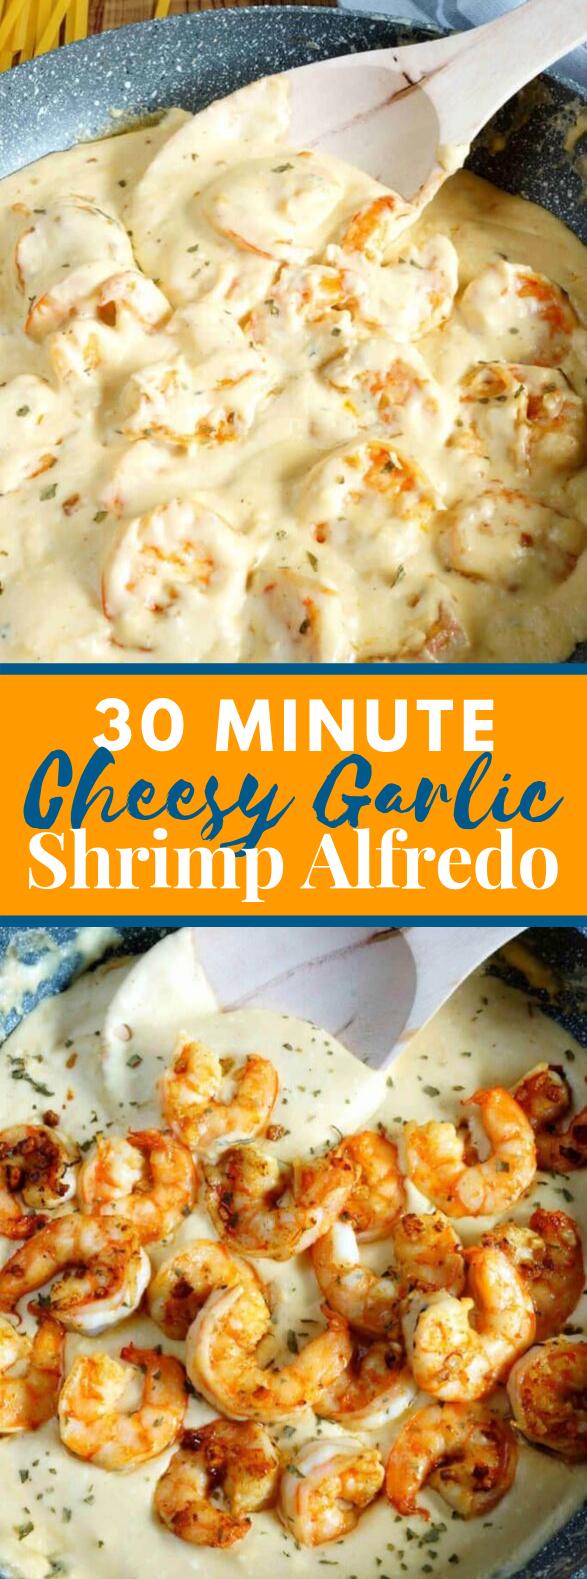 30 Minute Cheesy Garlic Shrimp Alfredo #dinner #homemade